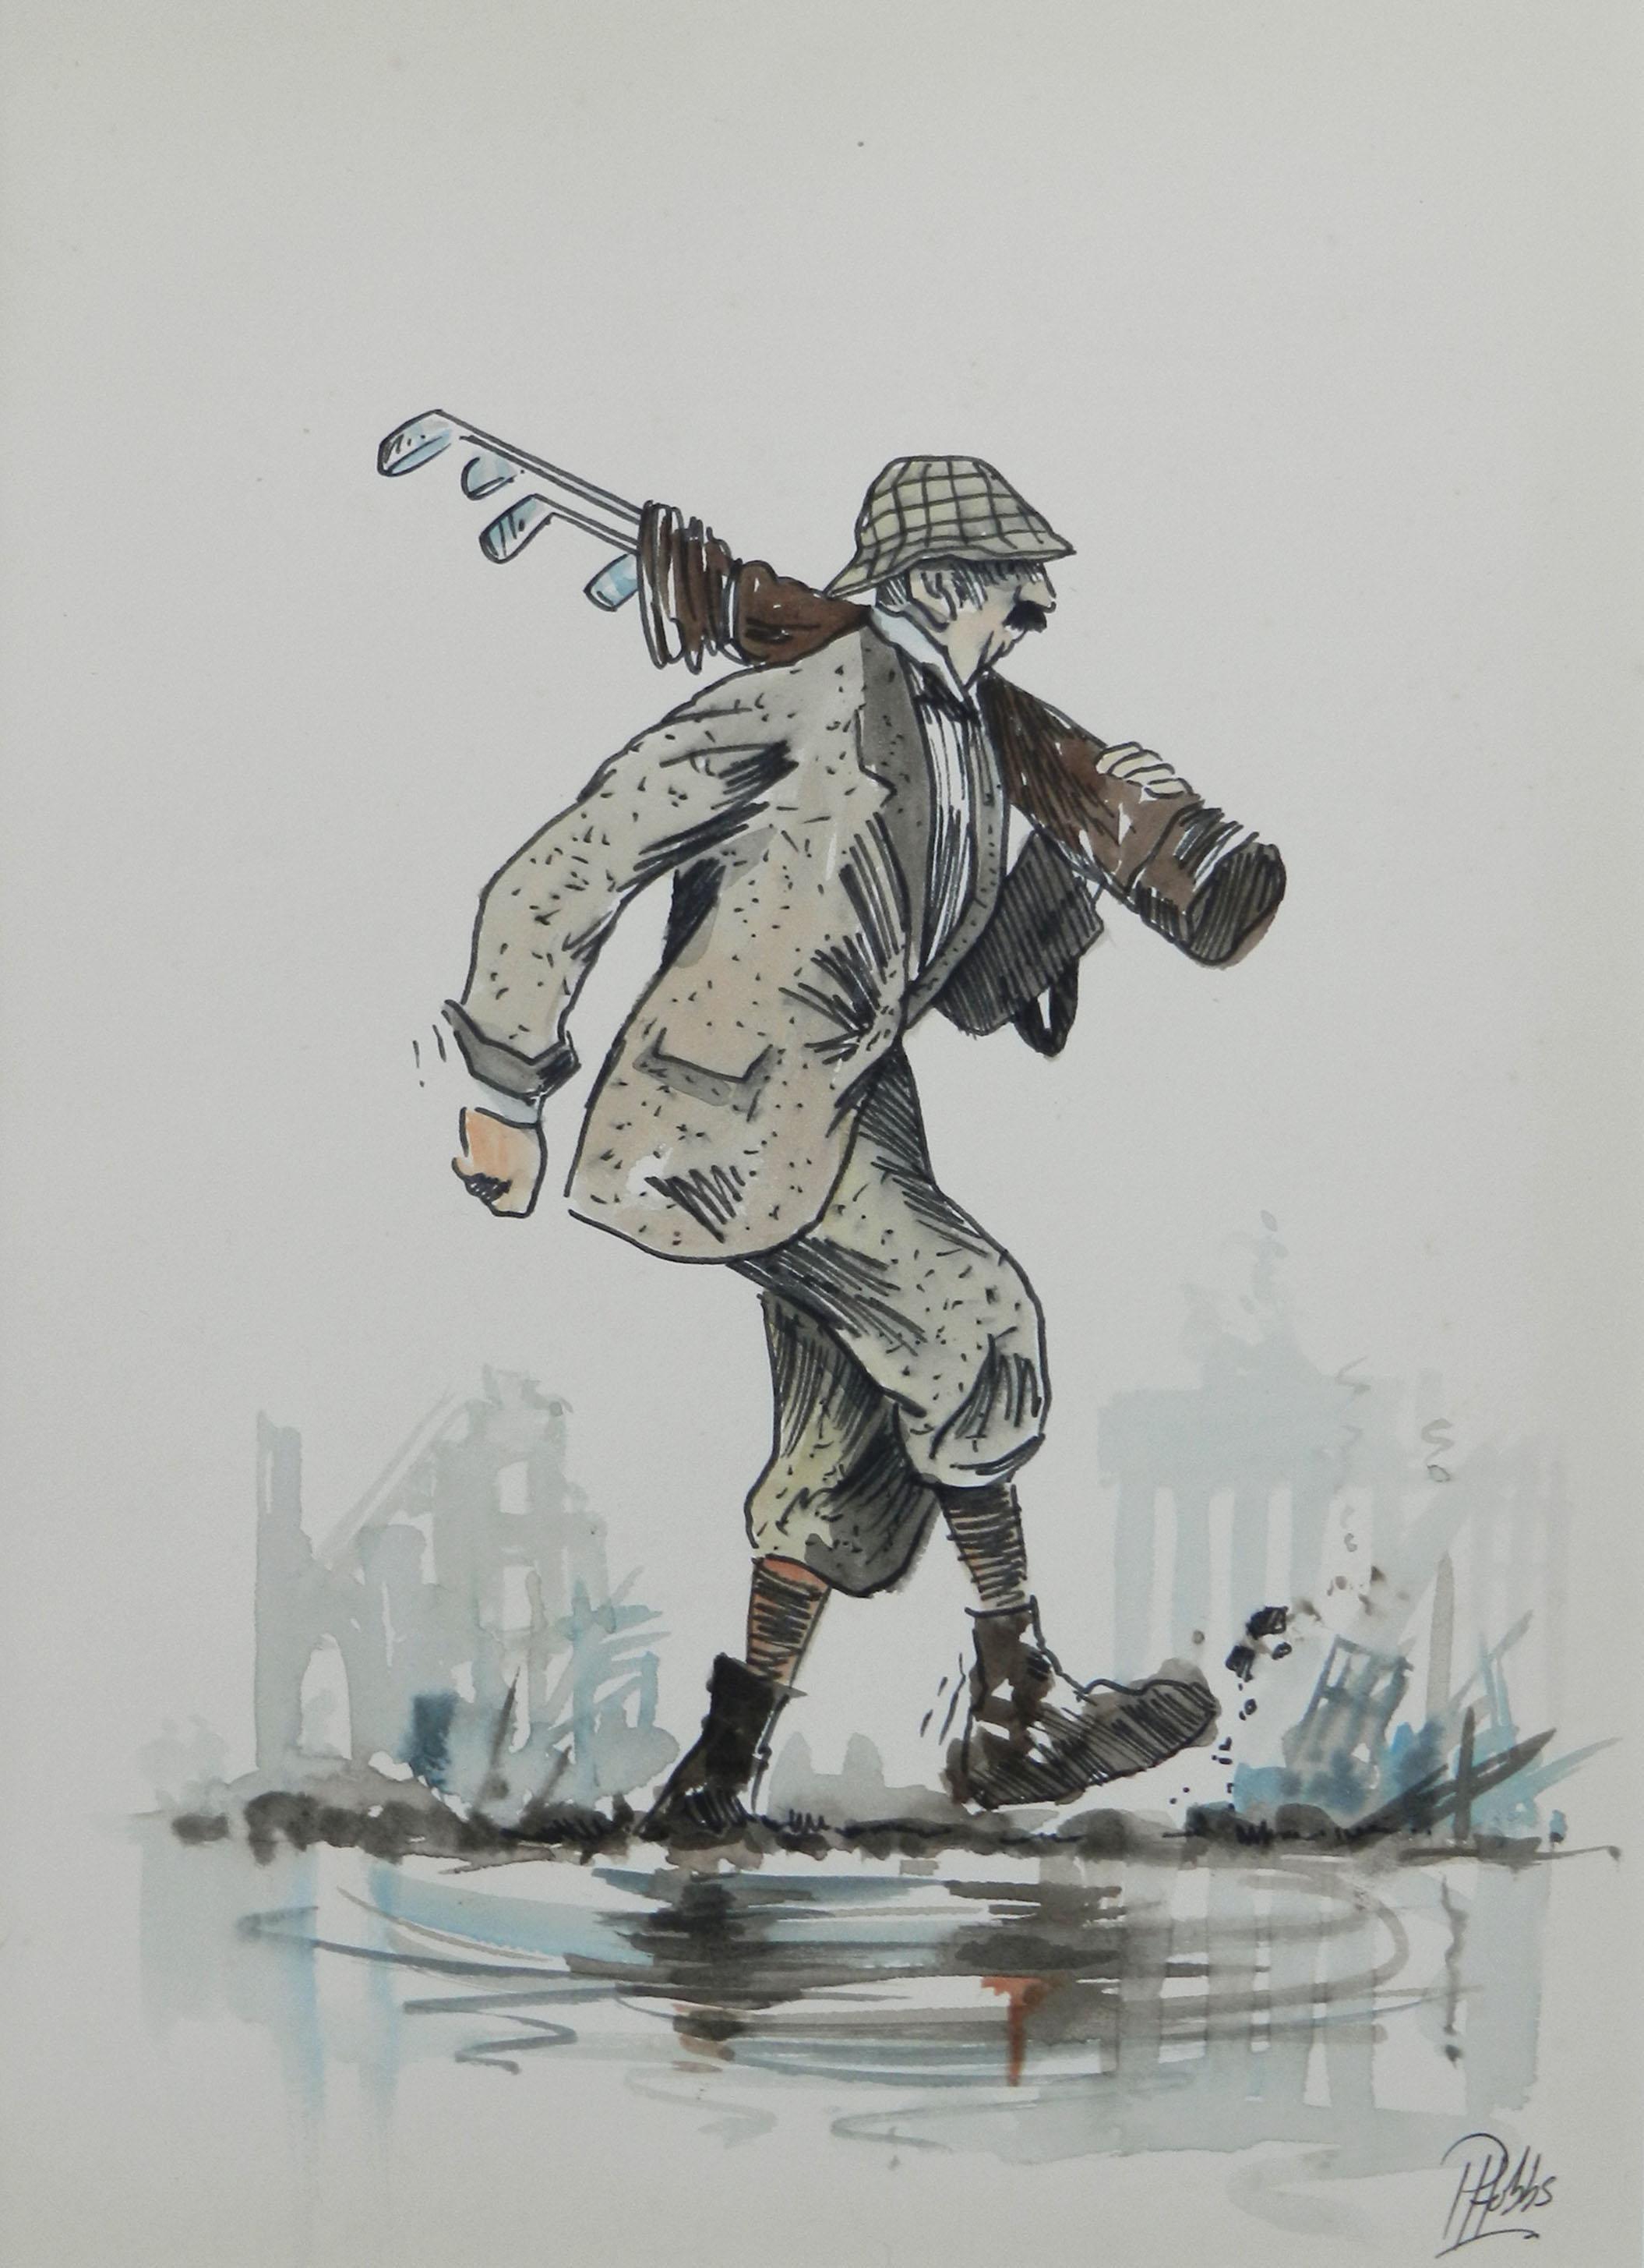 Caricature of Golfer by Peter Hobbs Water Bunker Golf Original Painting c1950